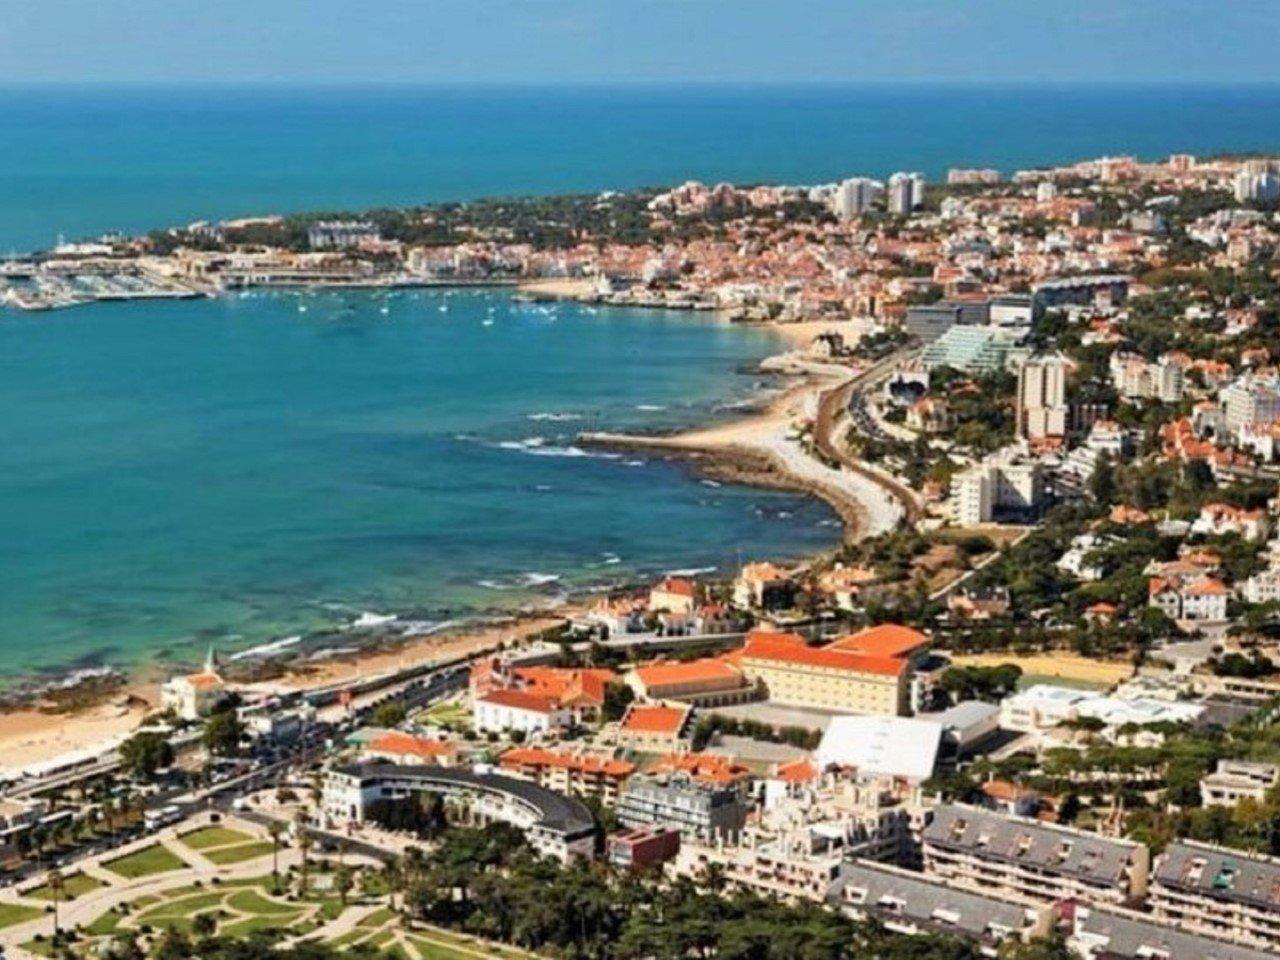 3 Bedroom Apartment Cascais, Lisbon Ref: AMA14144